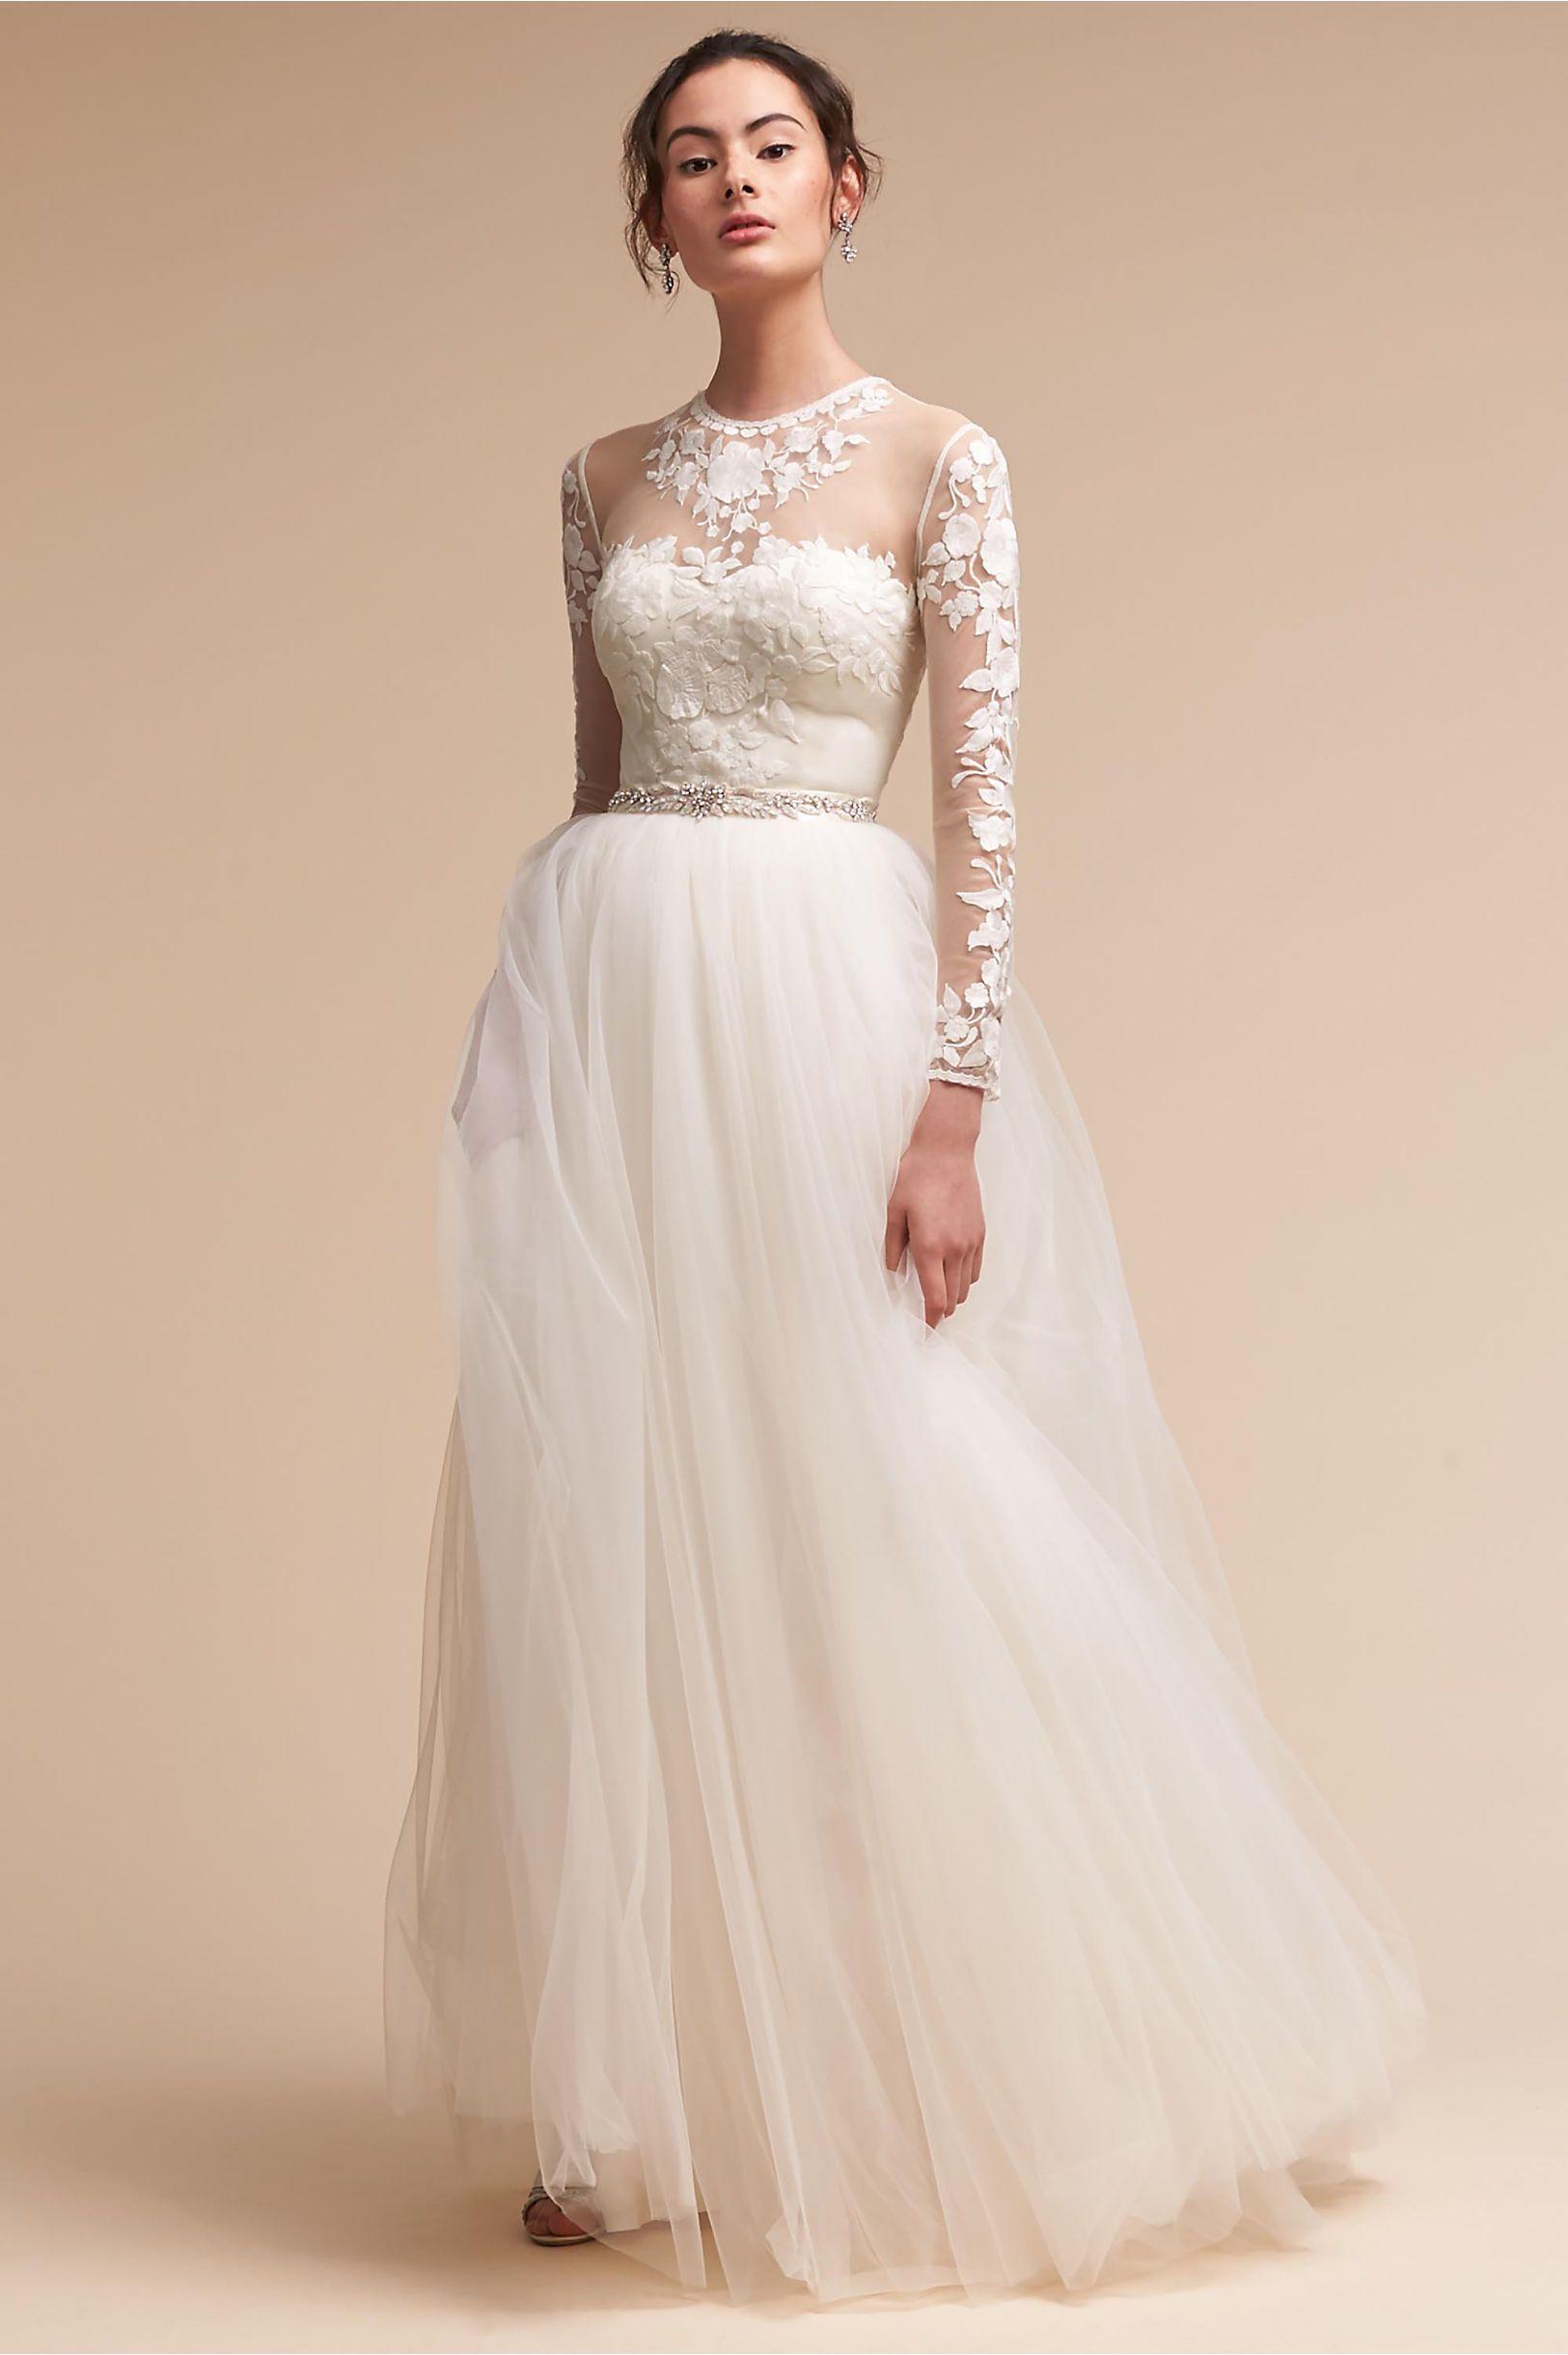 e16358b66d2 Wedding Dress with Bodysuit and Skirt